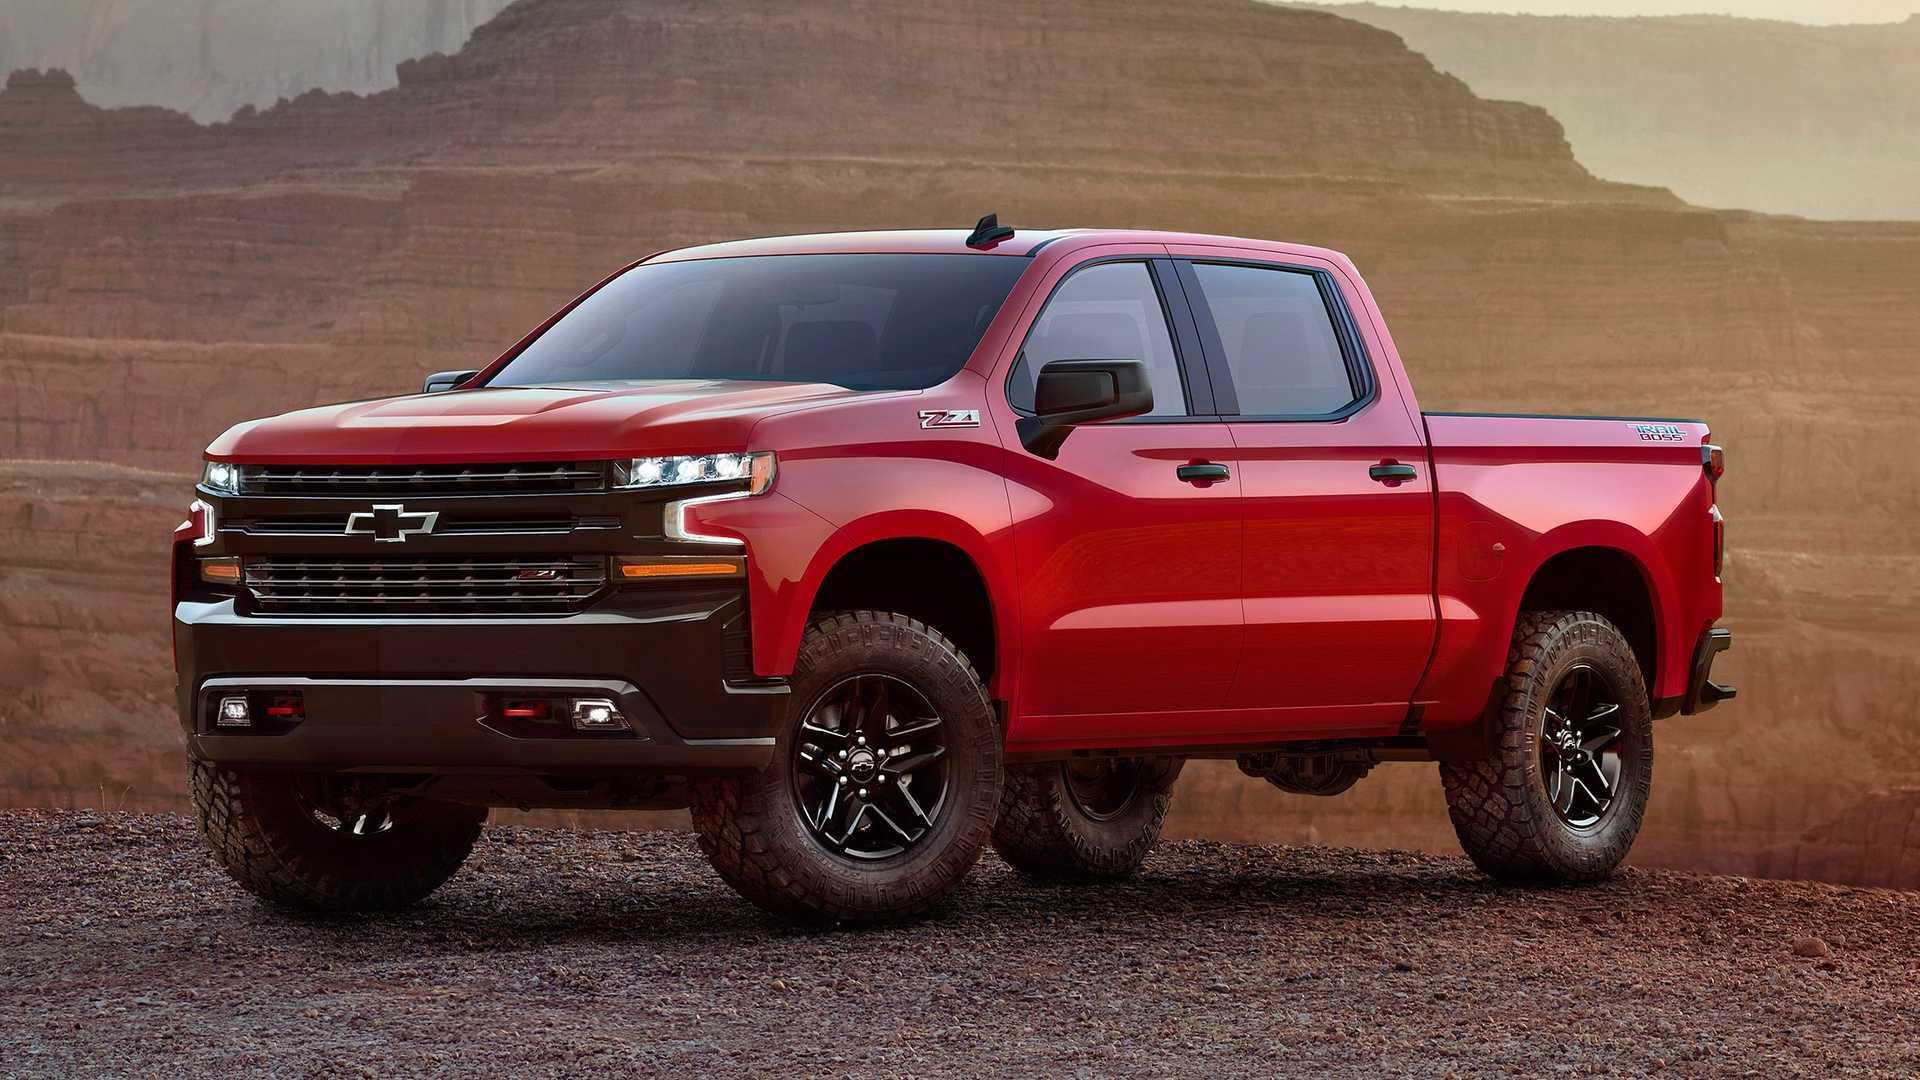 2021 Chevrolet Silverado, yüksek irtifa testlerinde